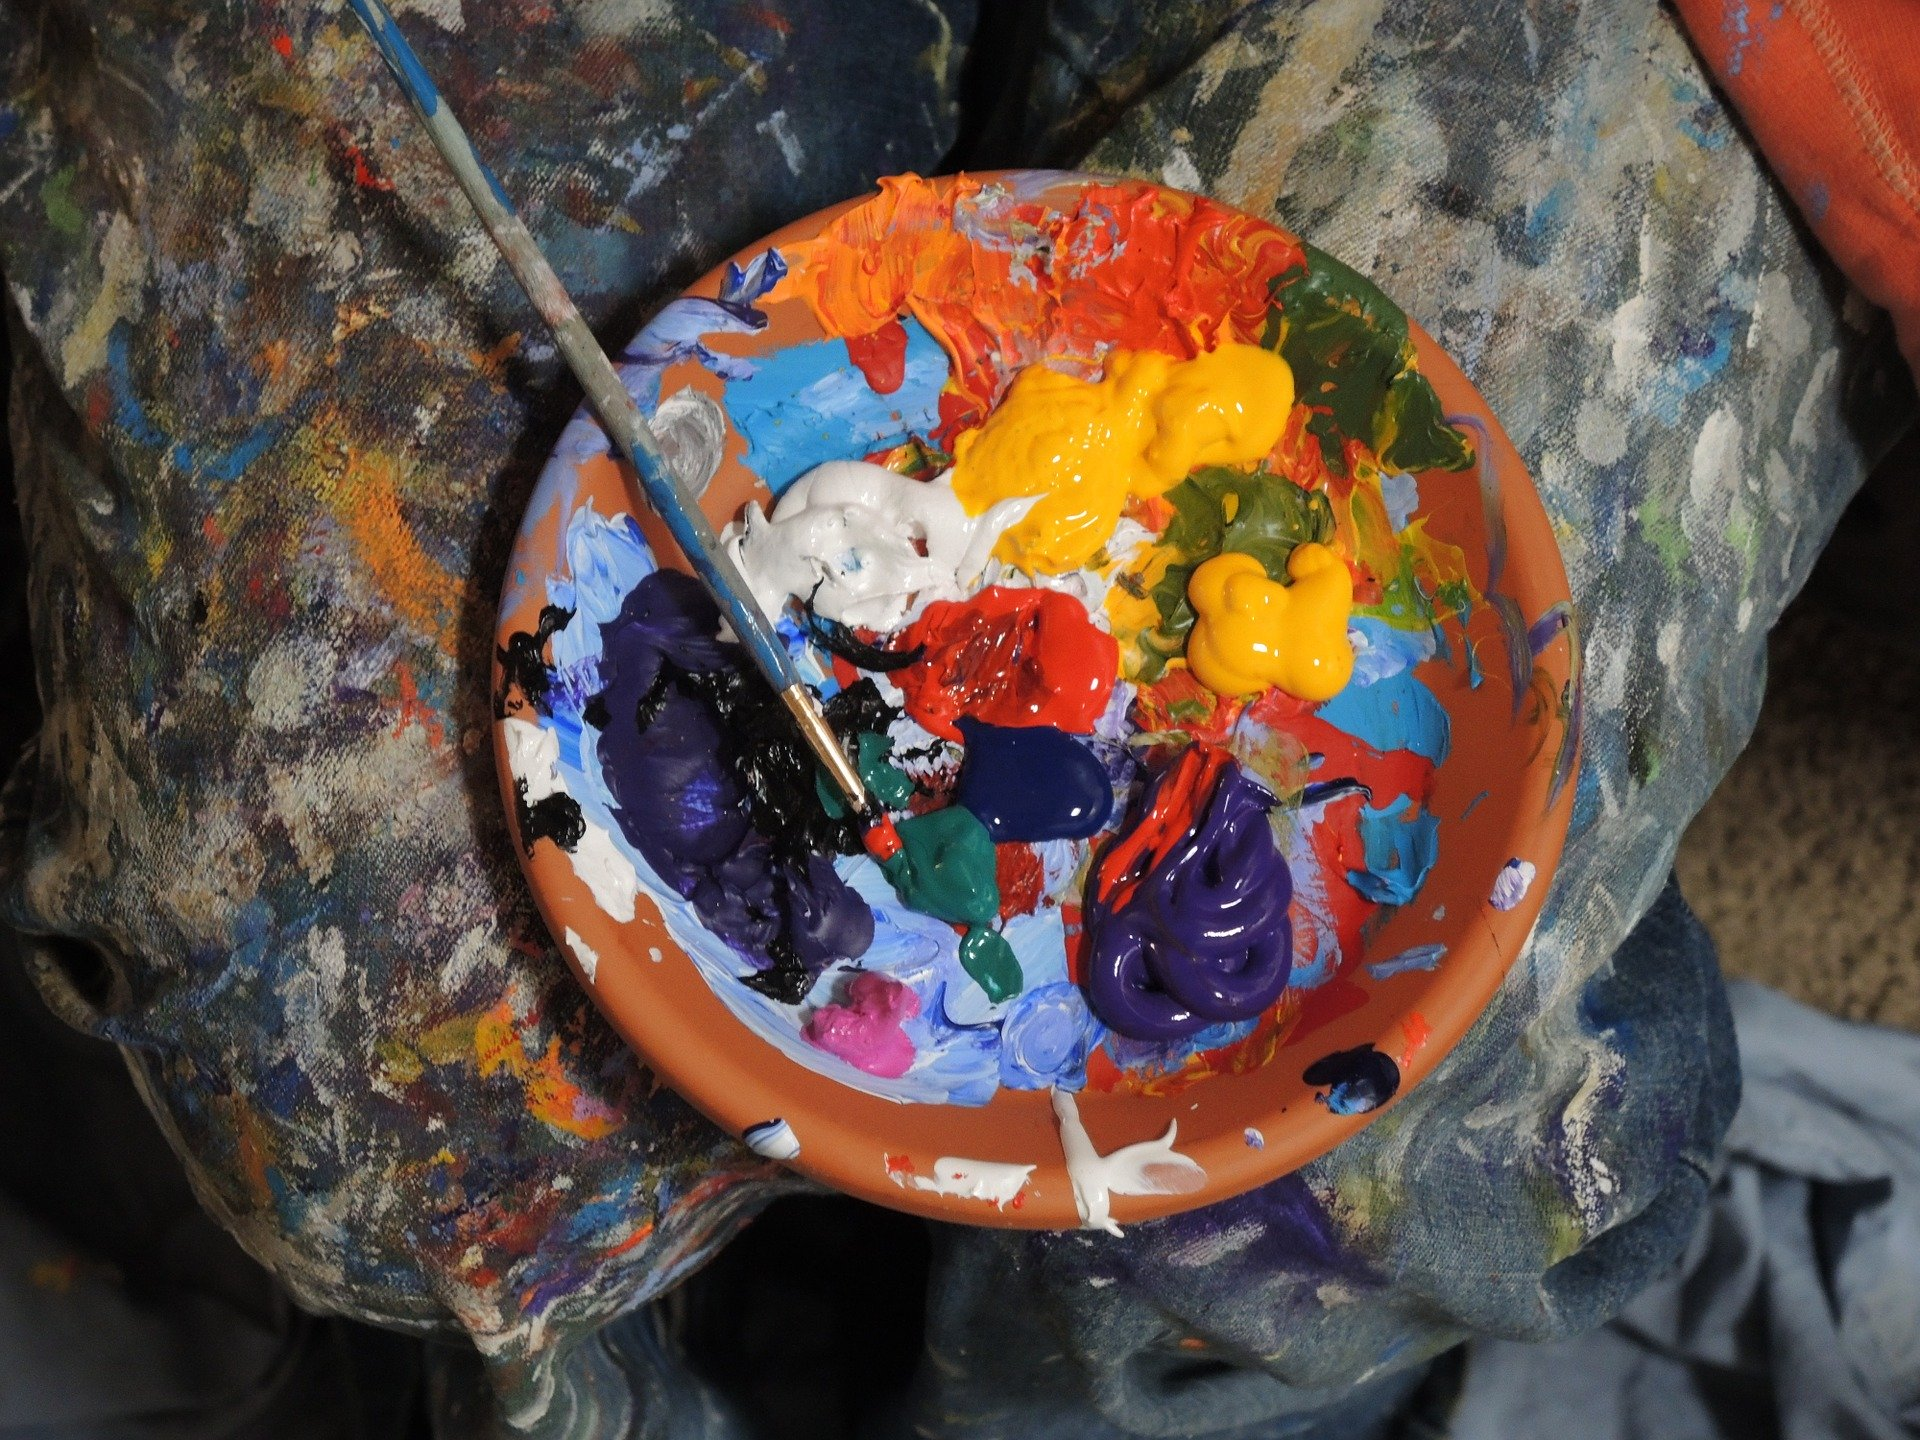 curs-desen-pictura-online-marian-moncea-artretreat1